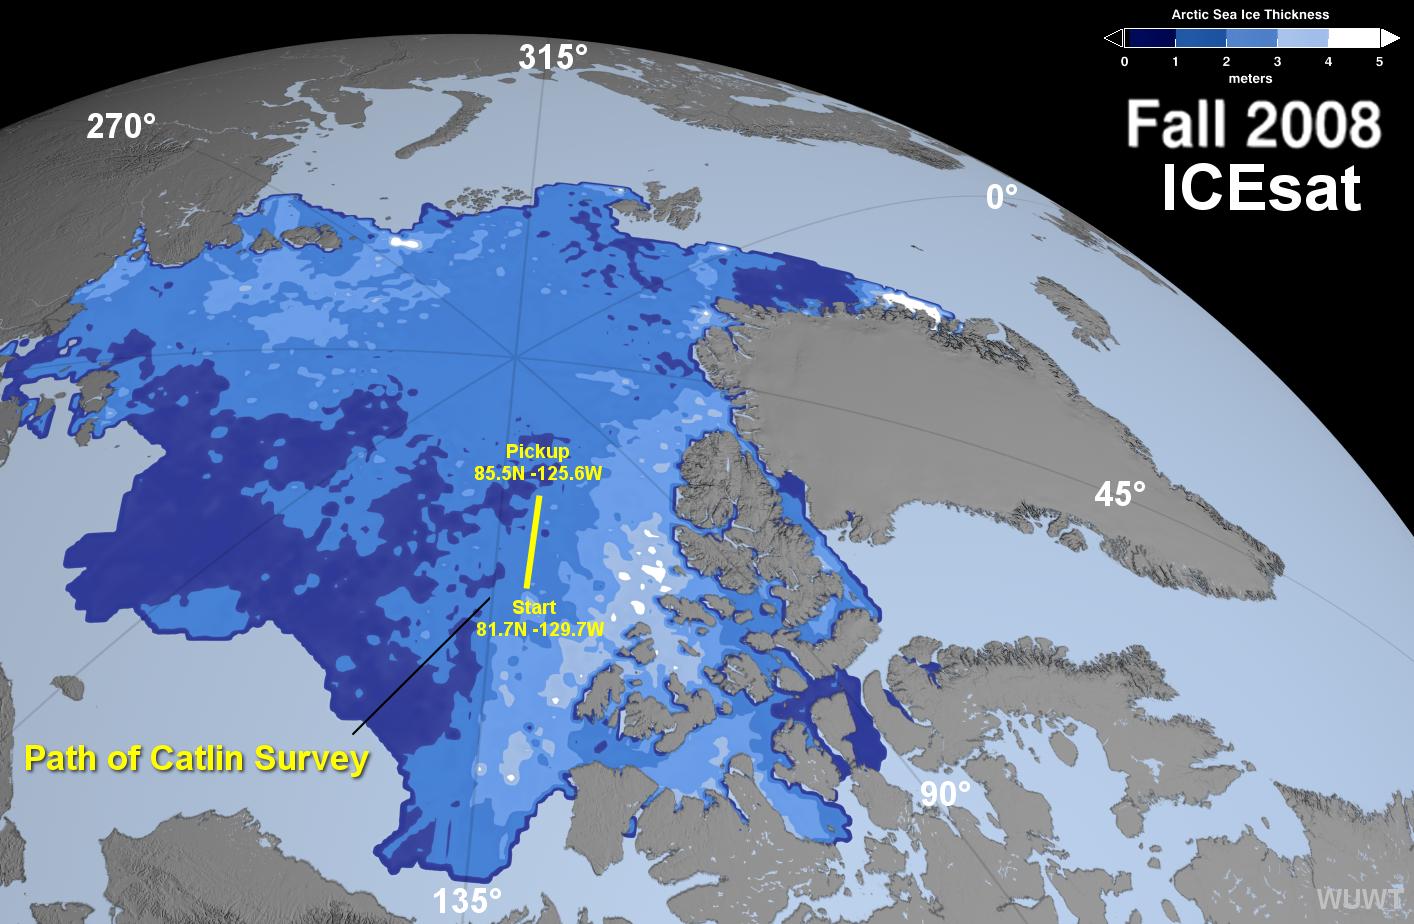 Catlin Arctic Survey Path over ICEsat map